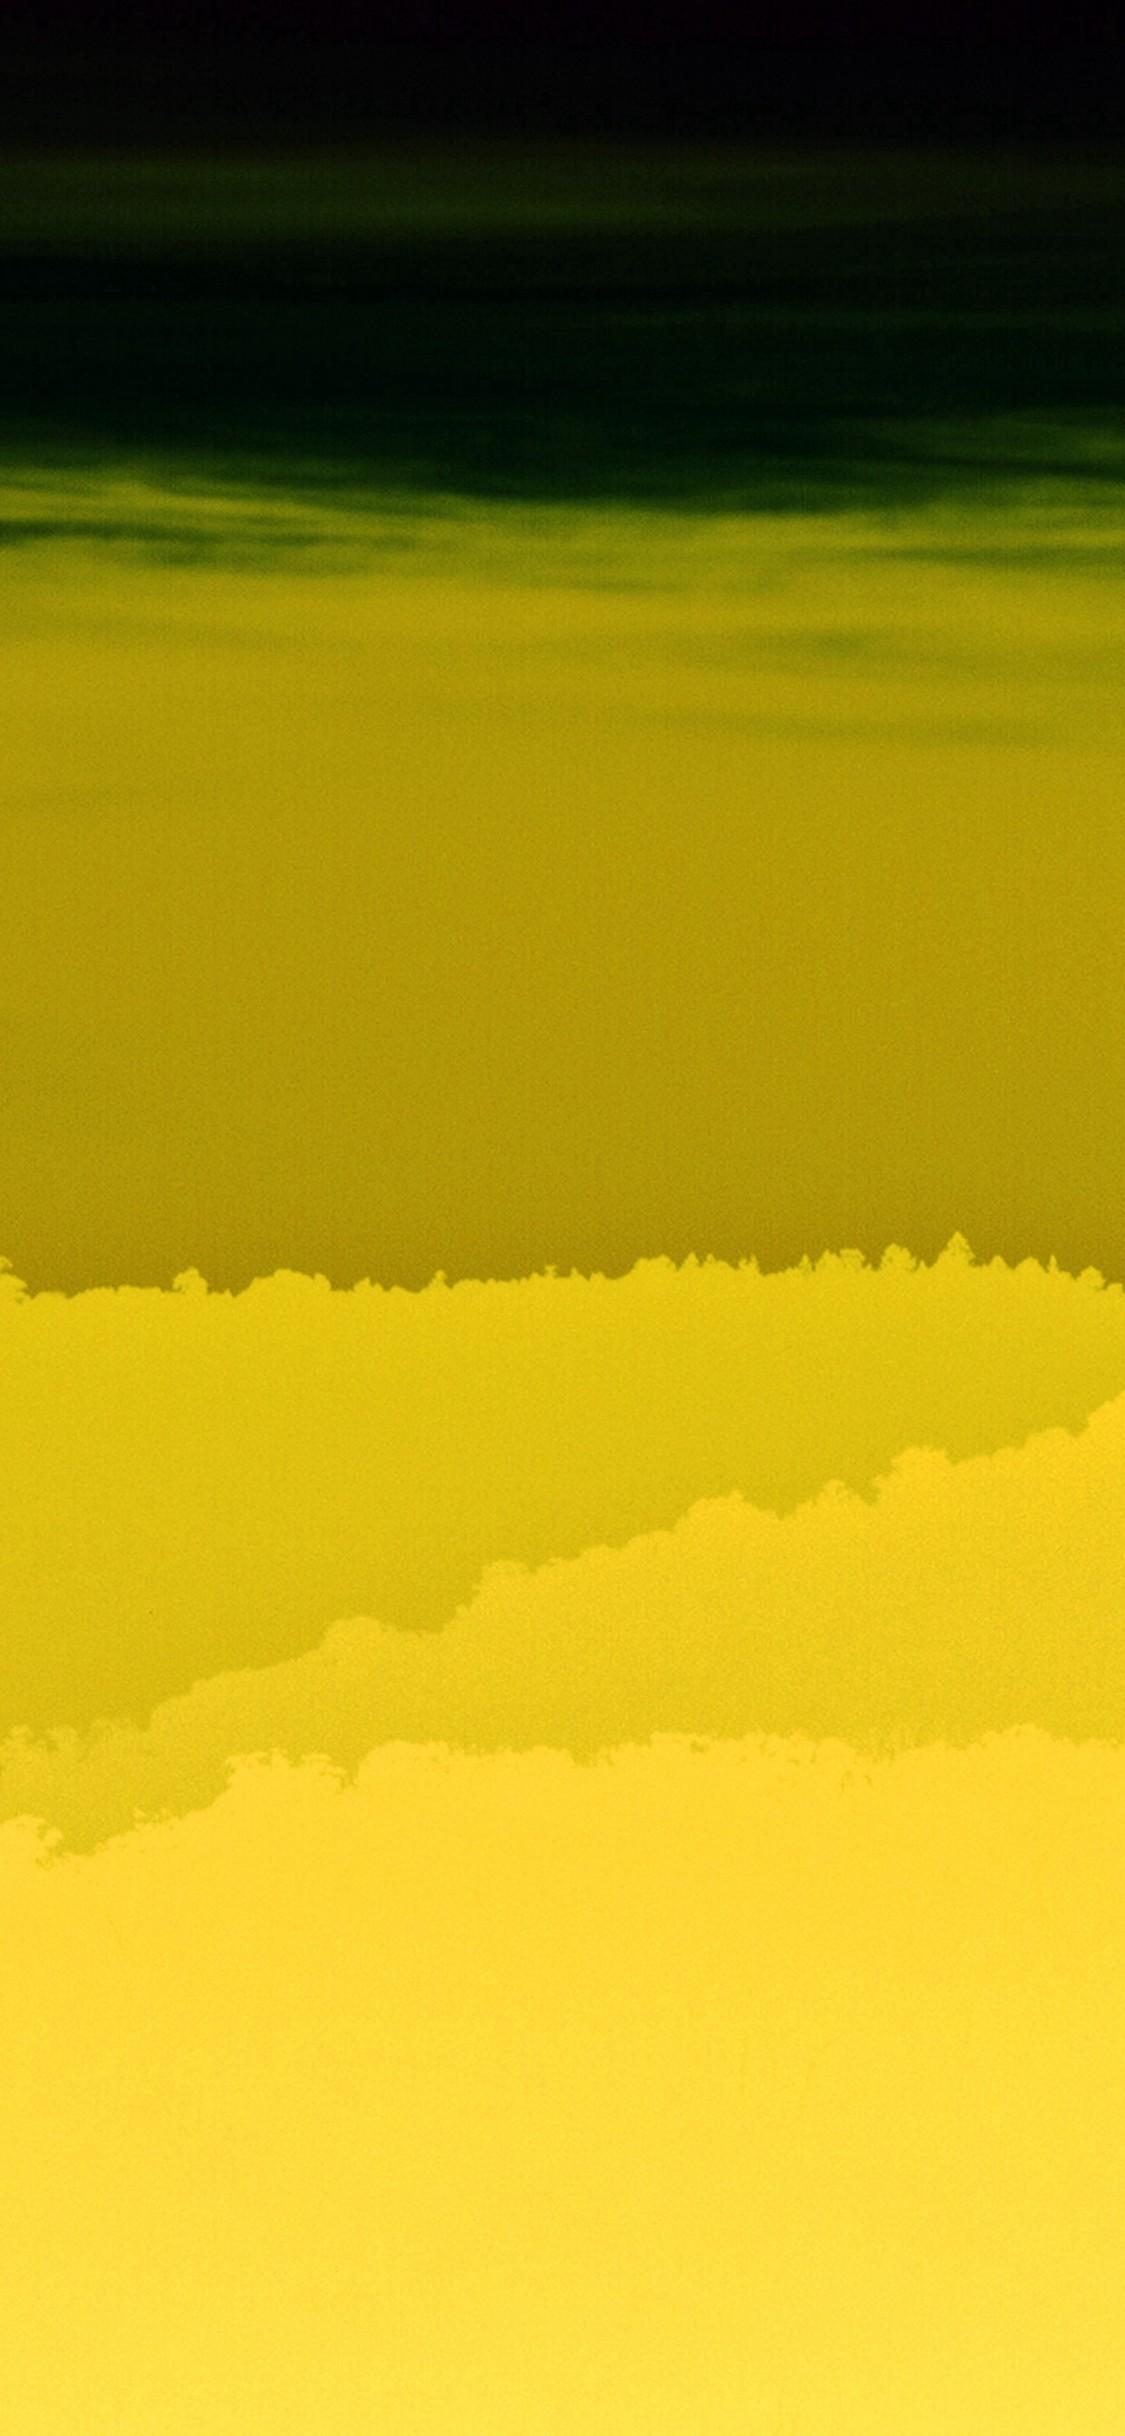 255 2550350 yellow mountain morning sunrise nature iphone x wallpaper